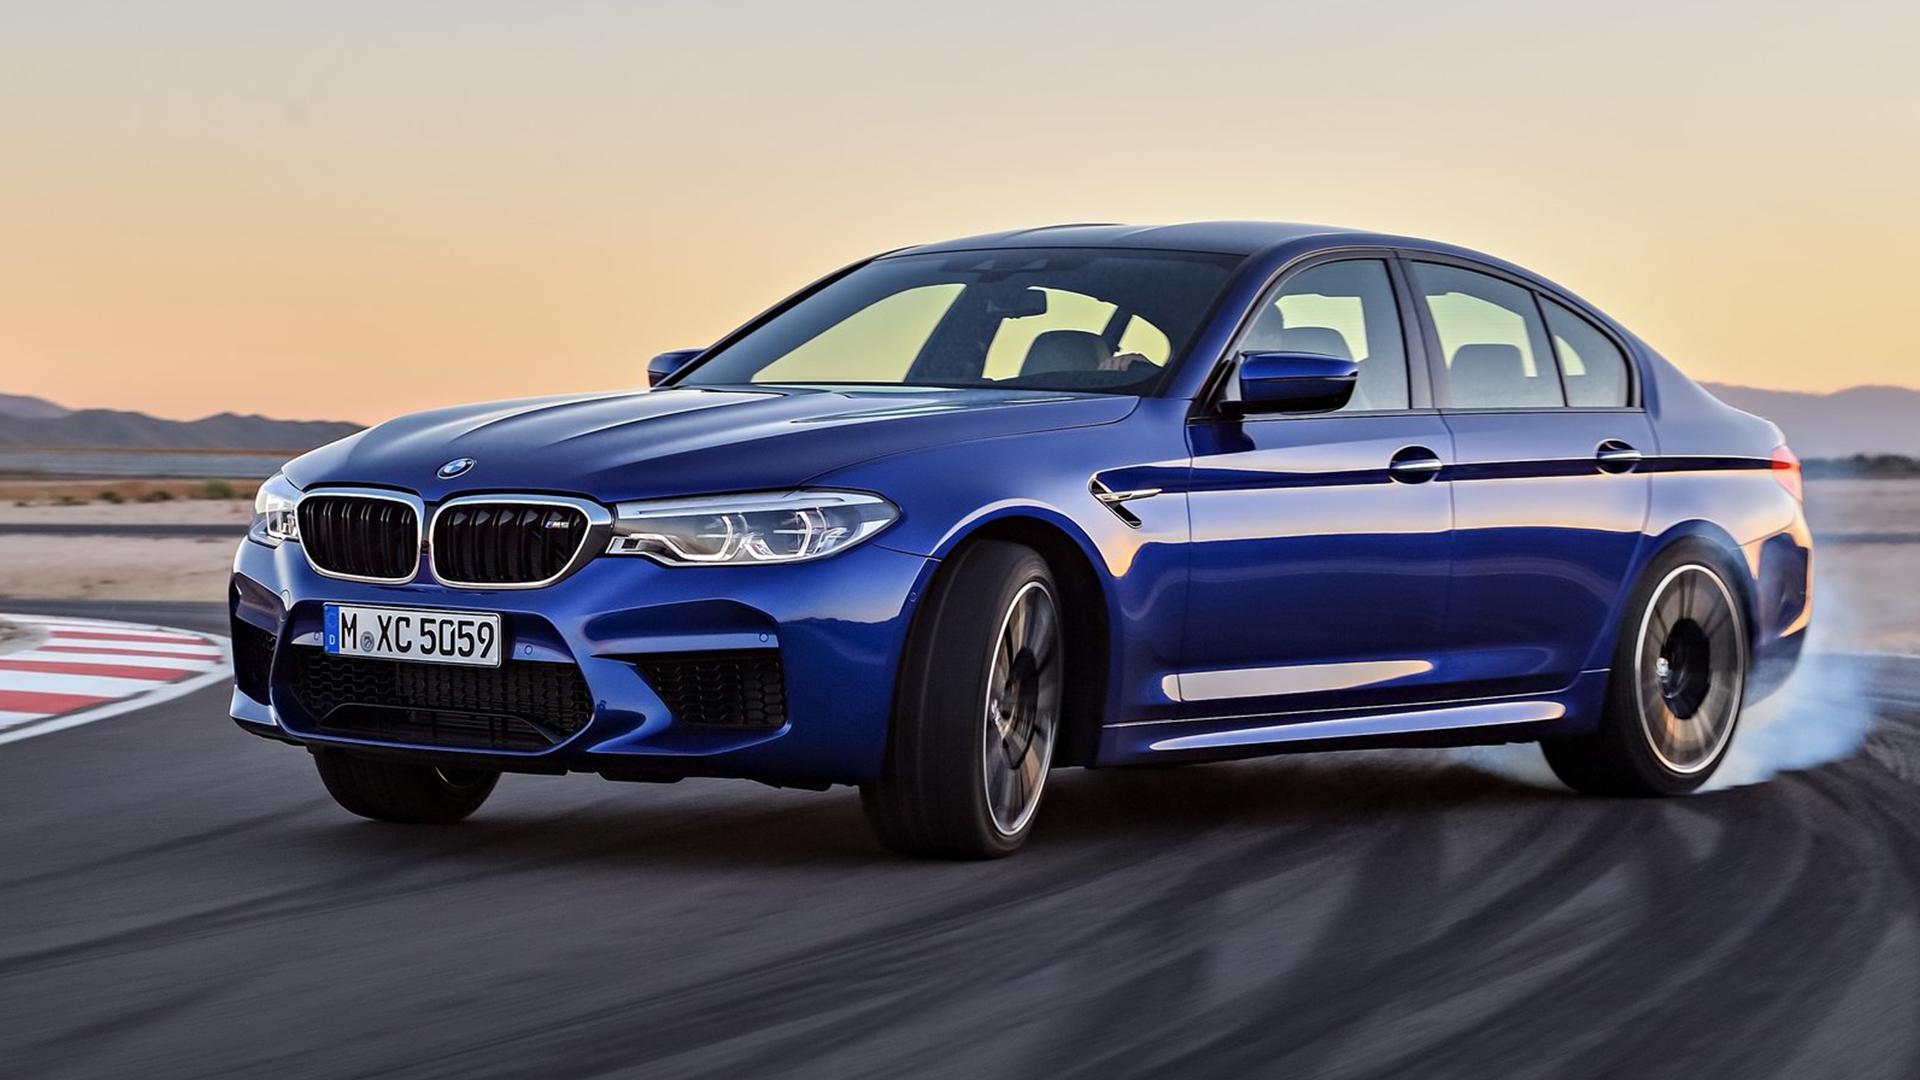 2018 BMW M5 Drifting